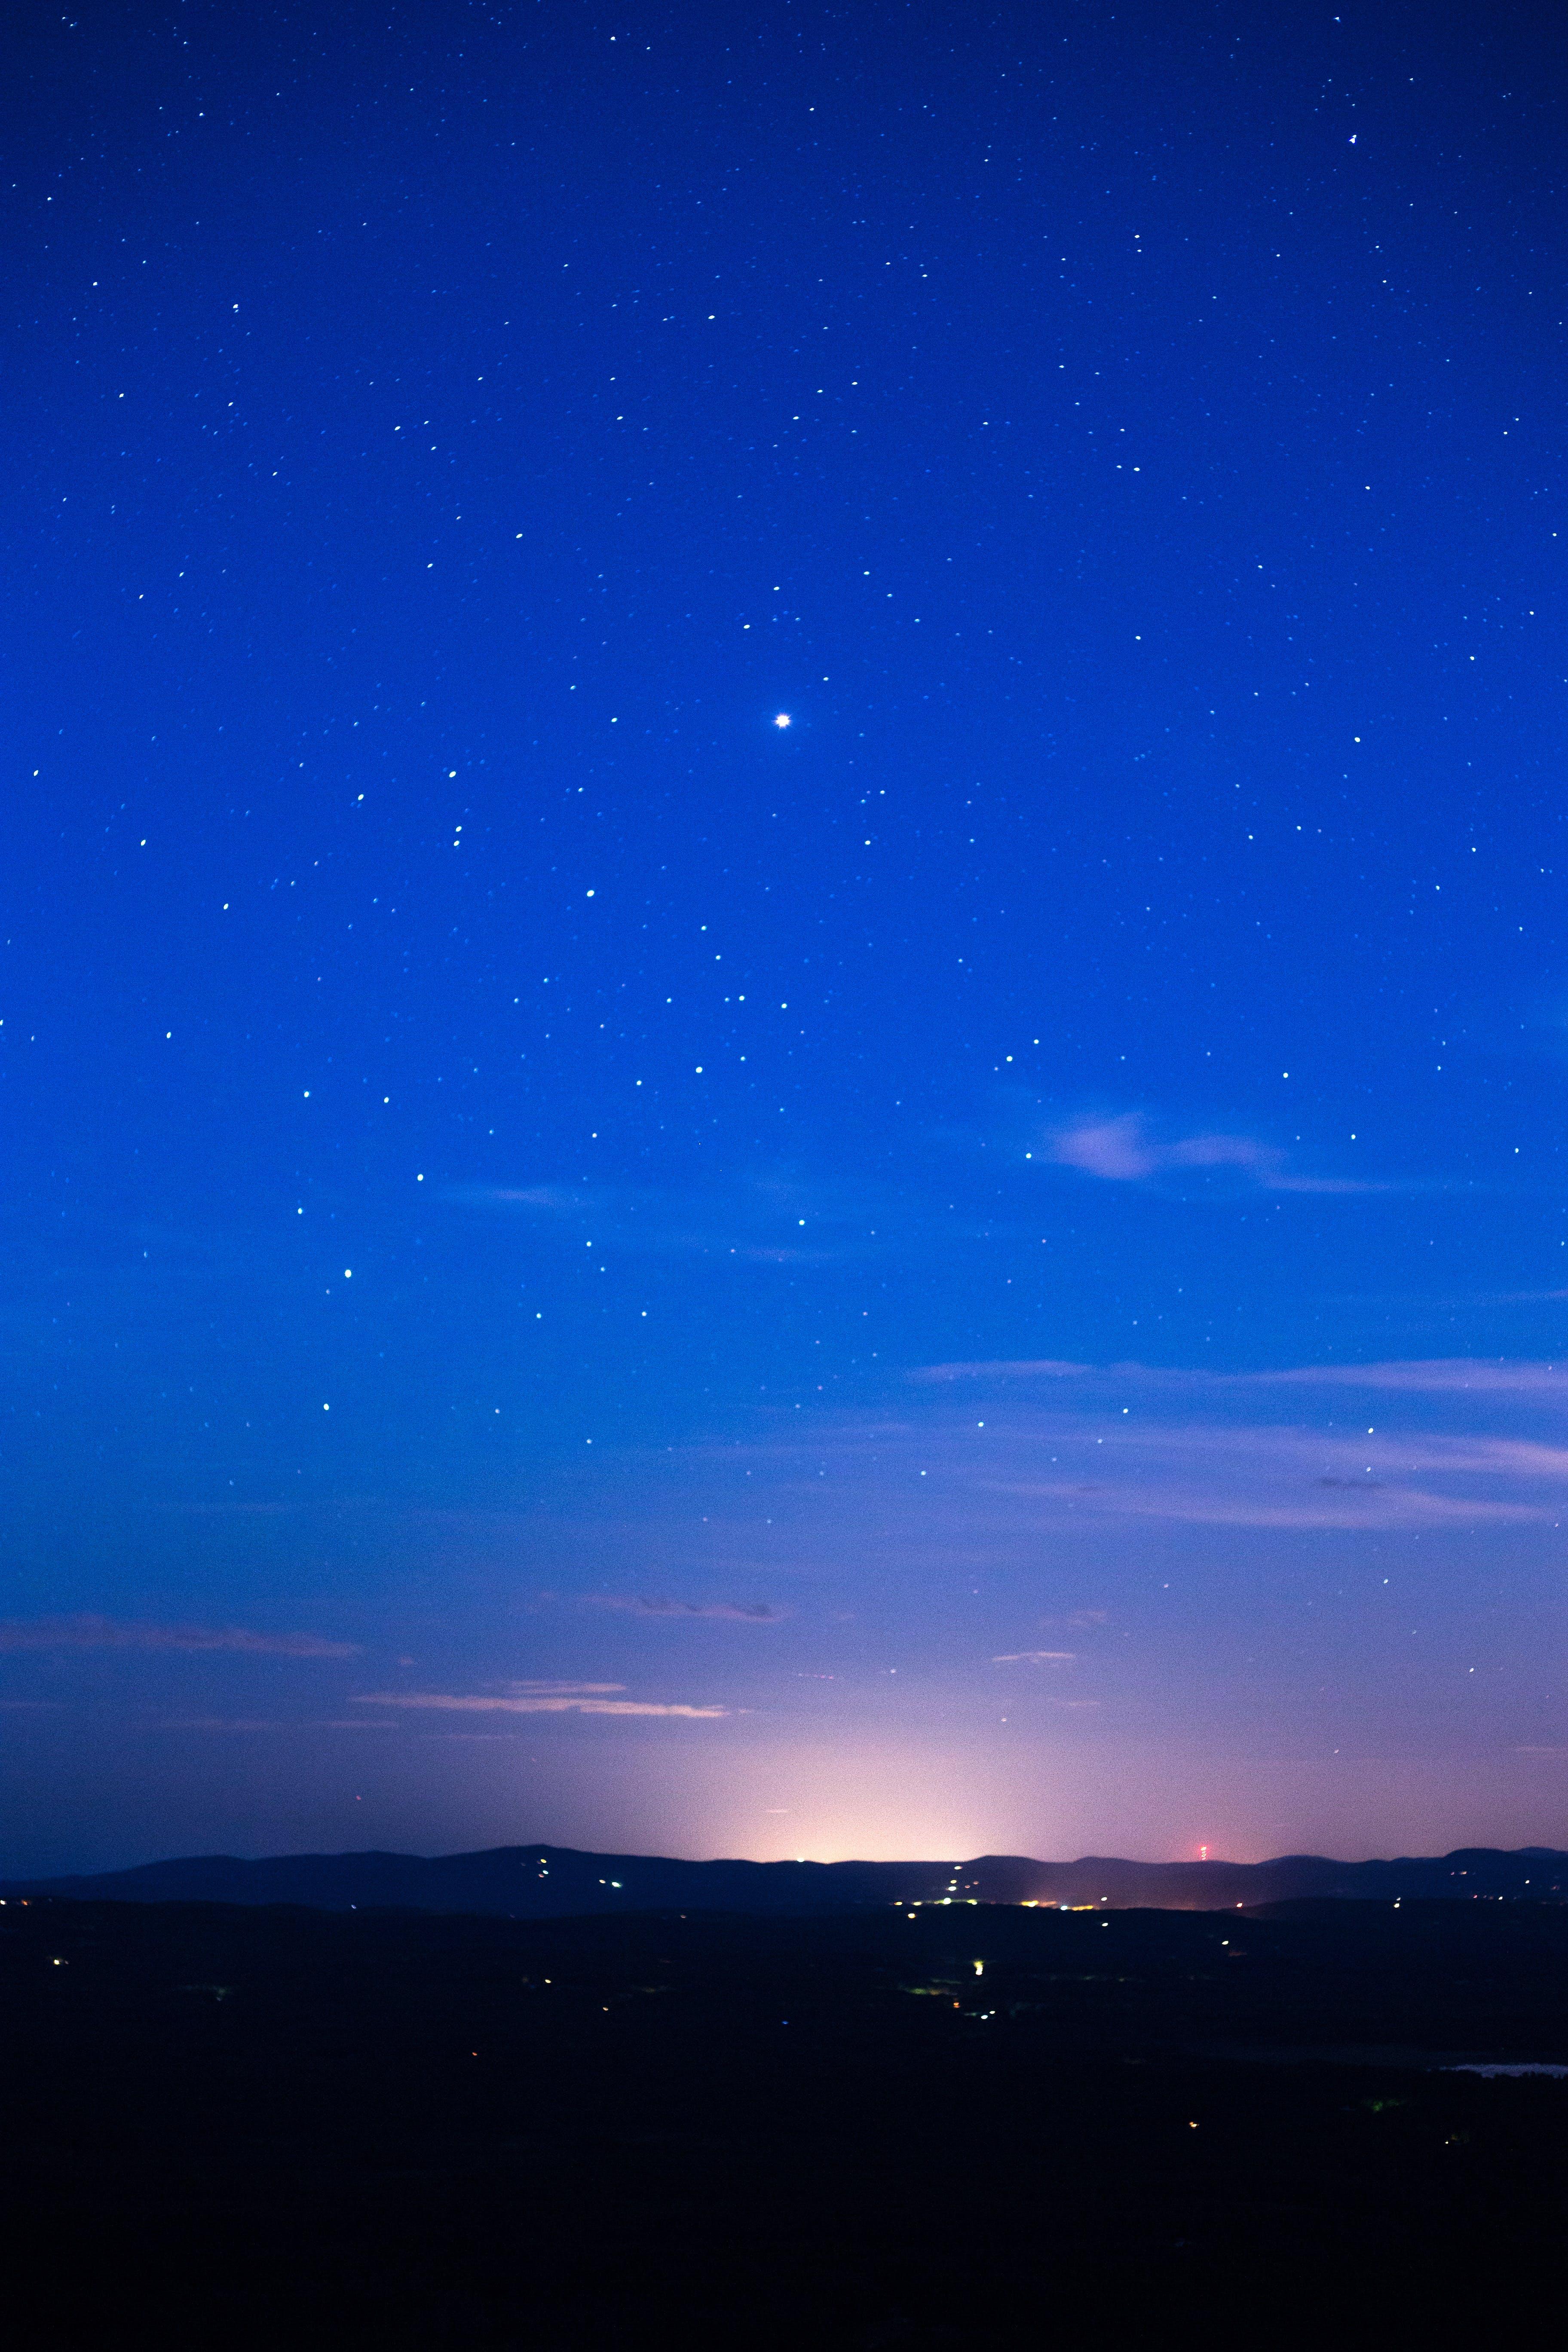 Silhouette of Mountain Range Under Stars